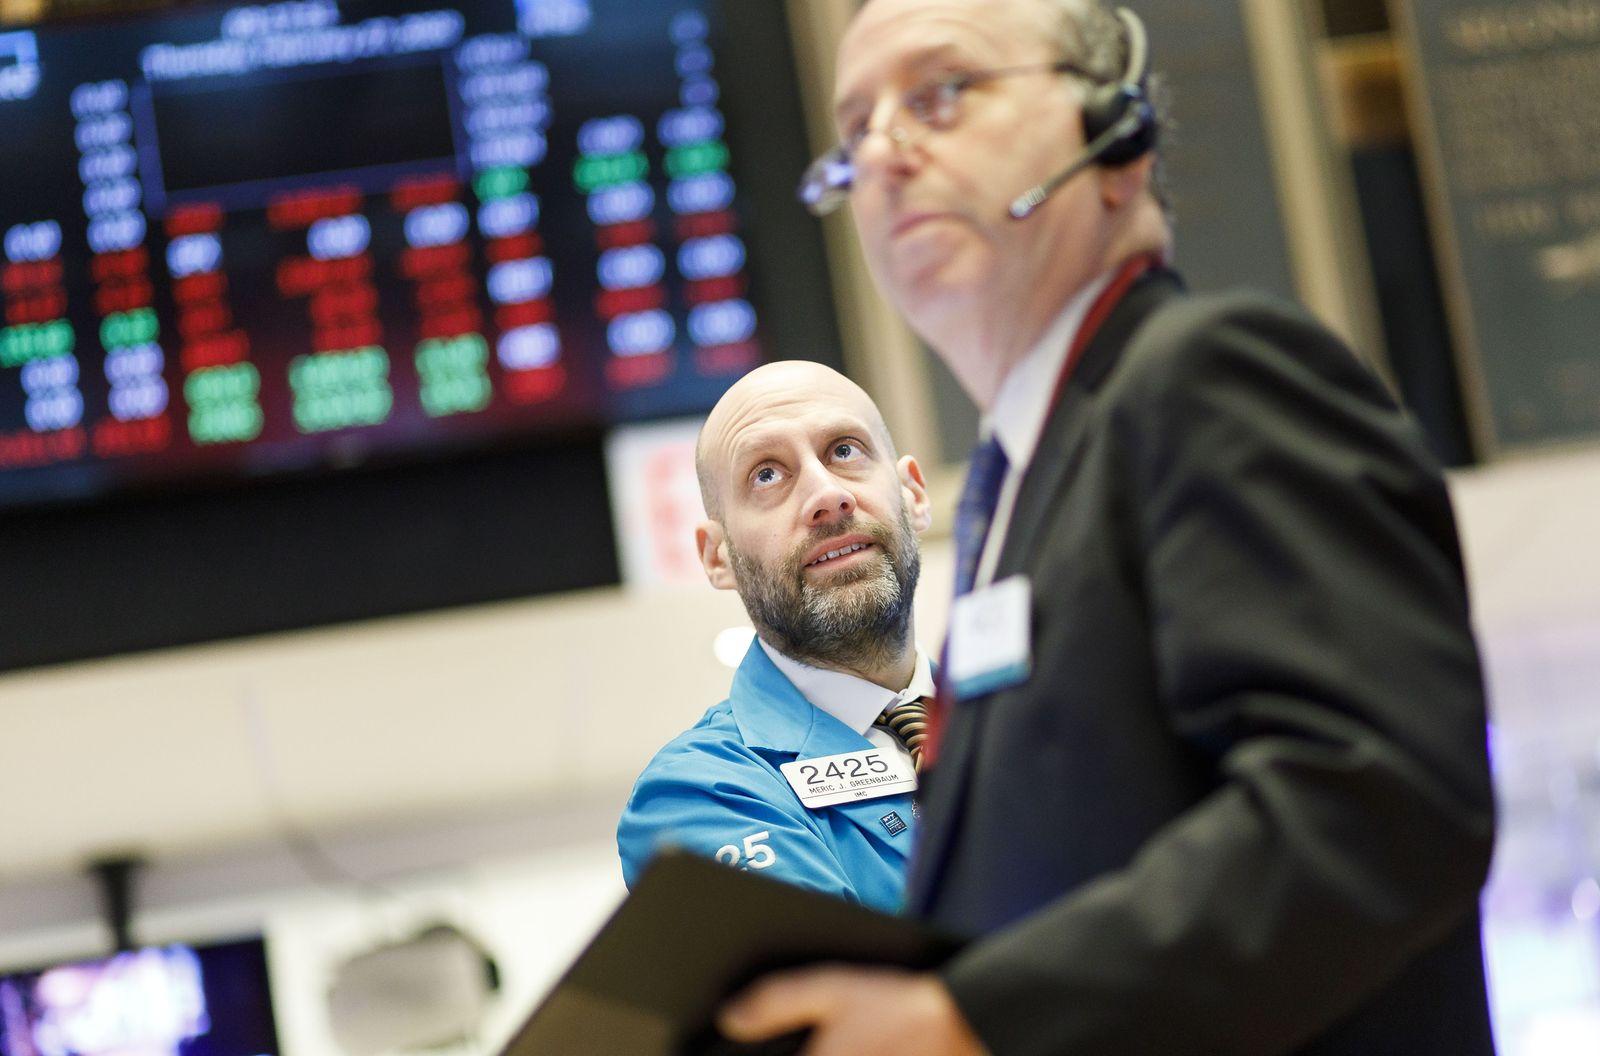 New York Stock Exchange Coronaviurus reaction, USA - 27 Feb 2020